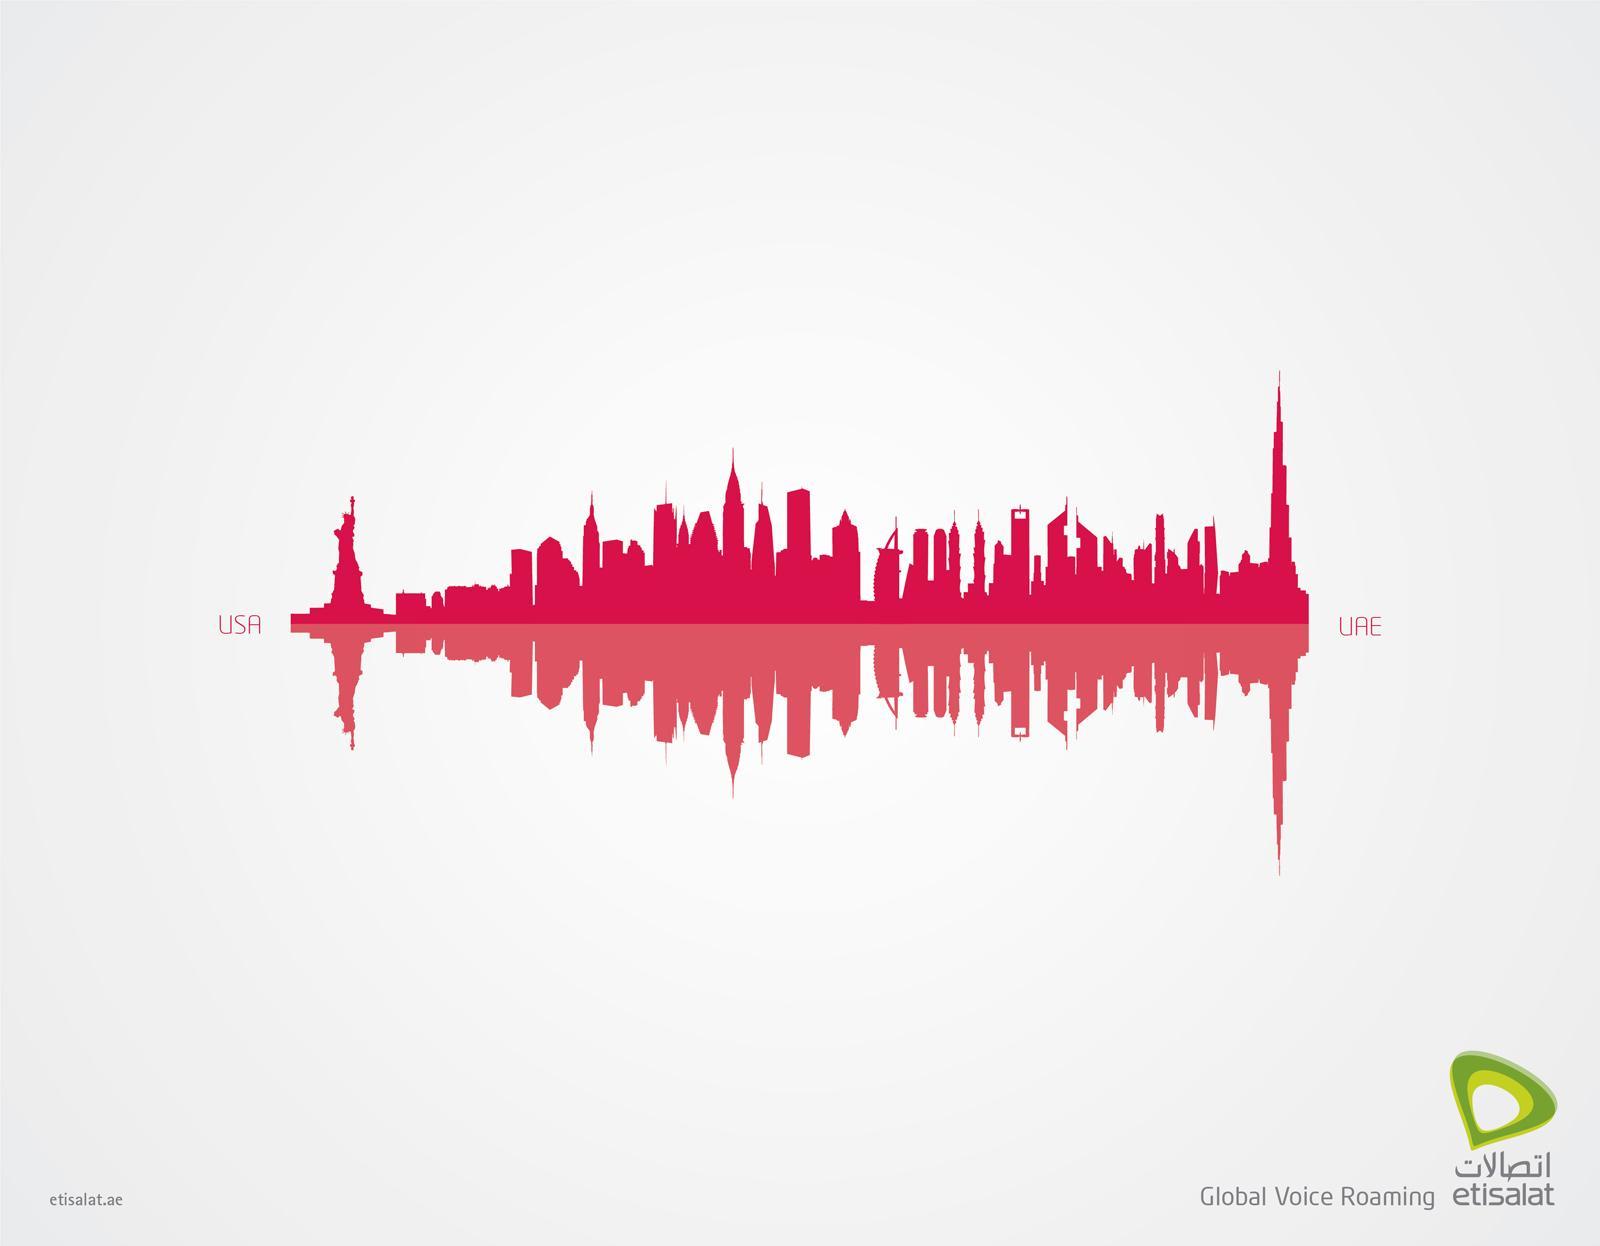 Etisalat Print Ad -  Global Voice Roaming, USA